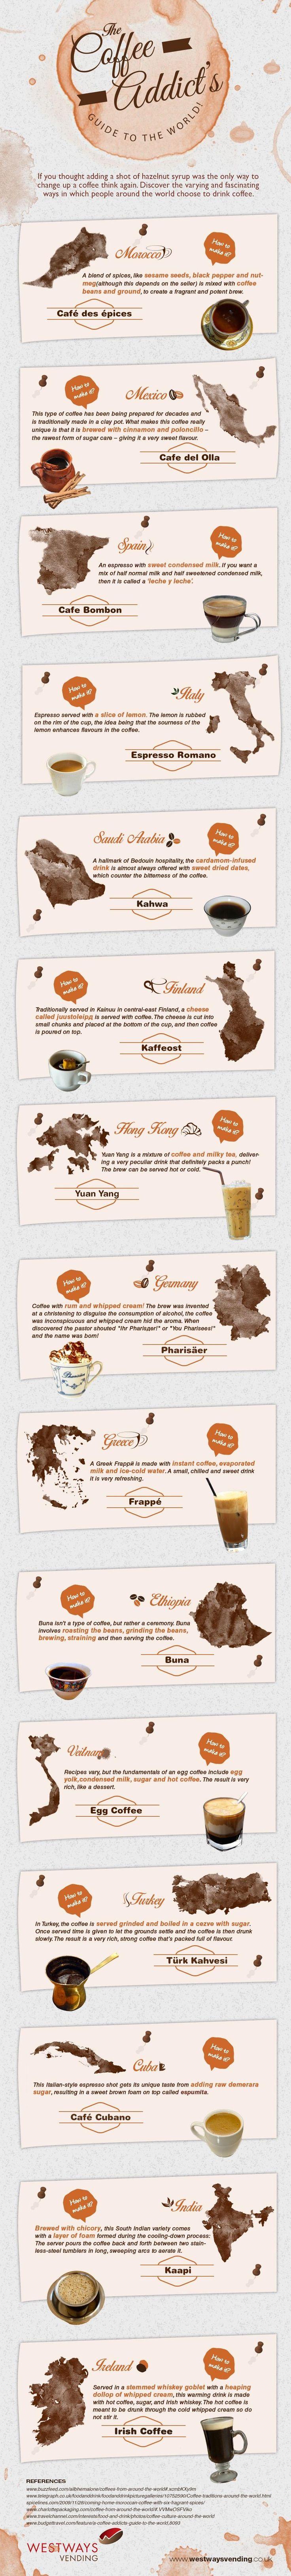 Coffees-of-the-World by weswaysvendindg via jetsetera #Infographic #Coffee